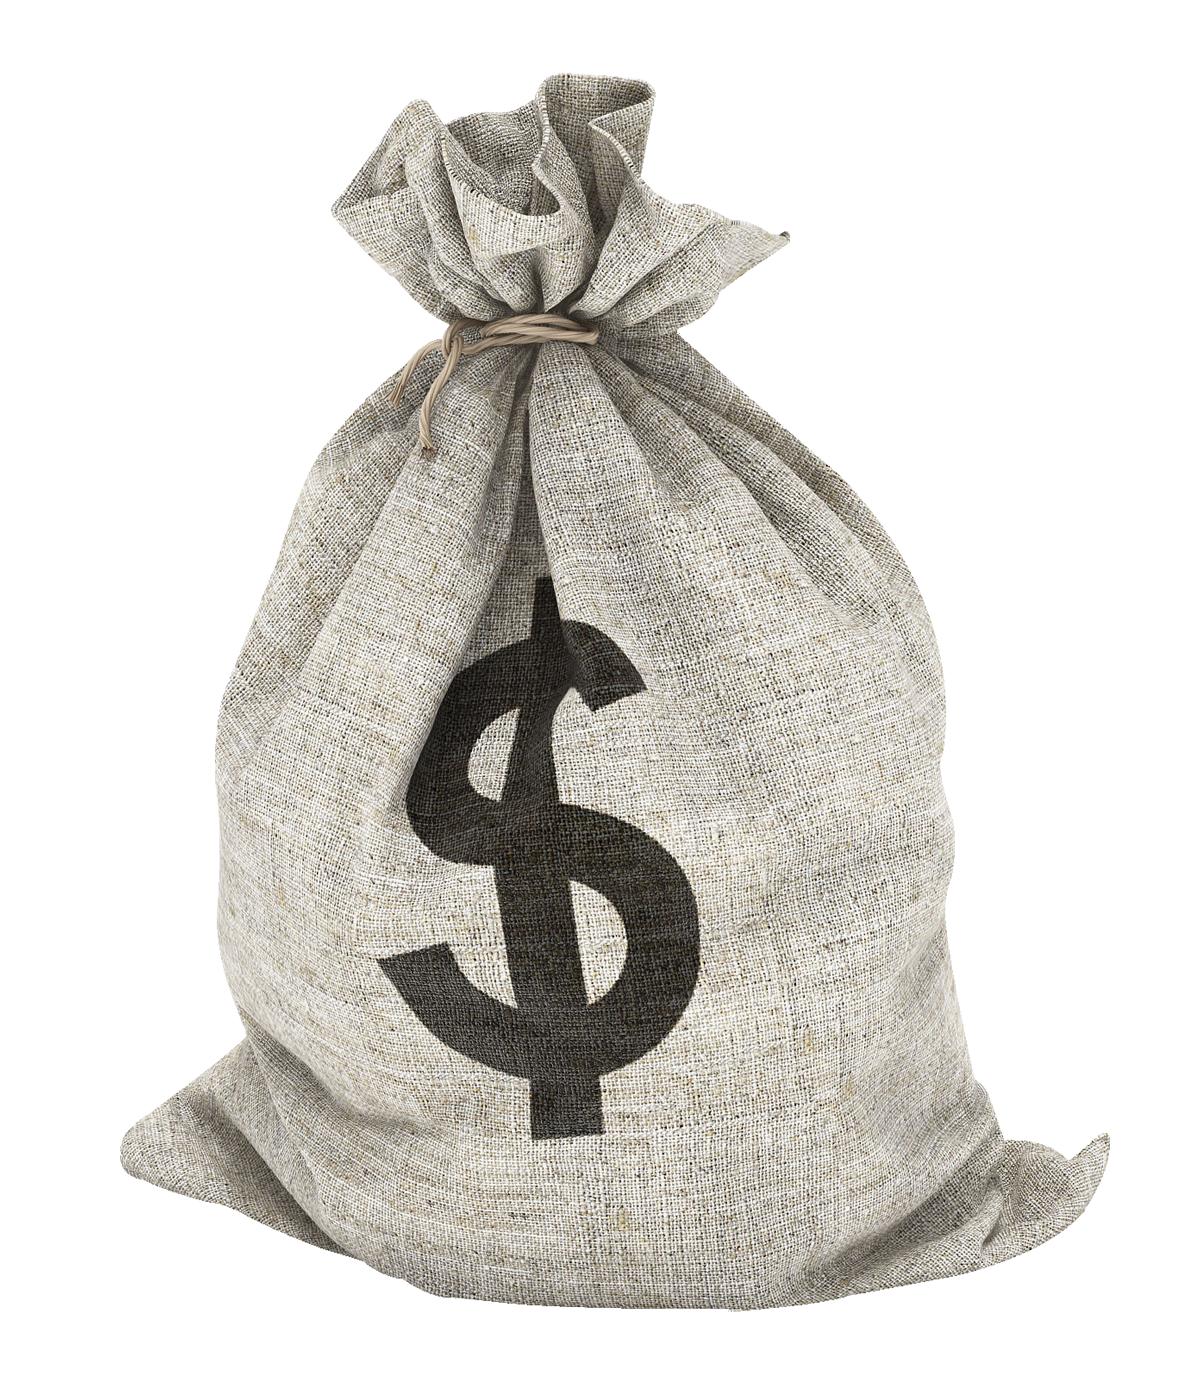 Money Bag PNG Image - PurePNG   Free transparent CC0 PNG ...